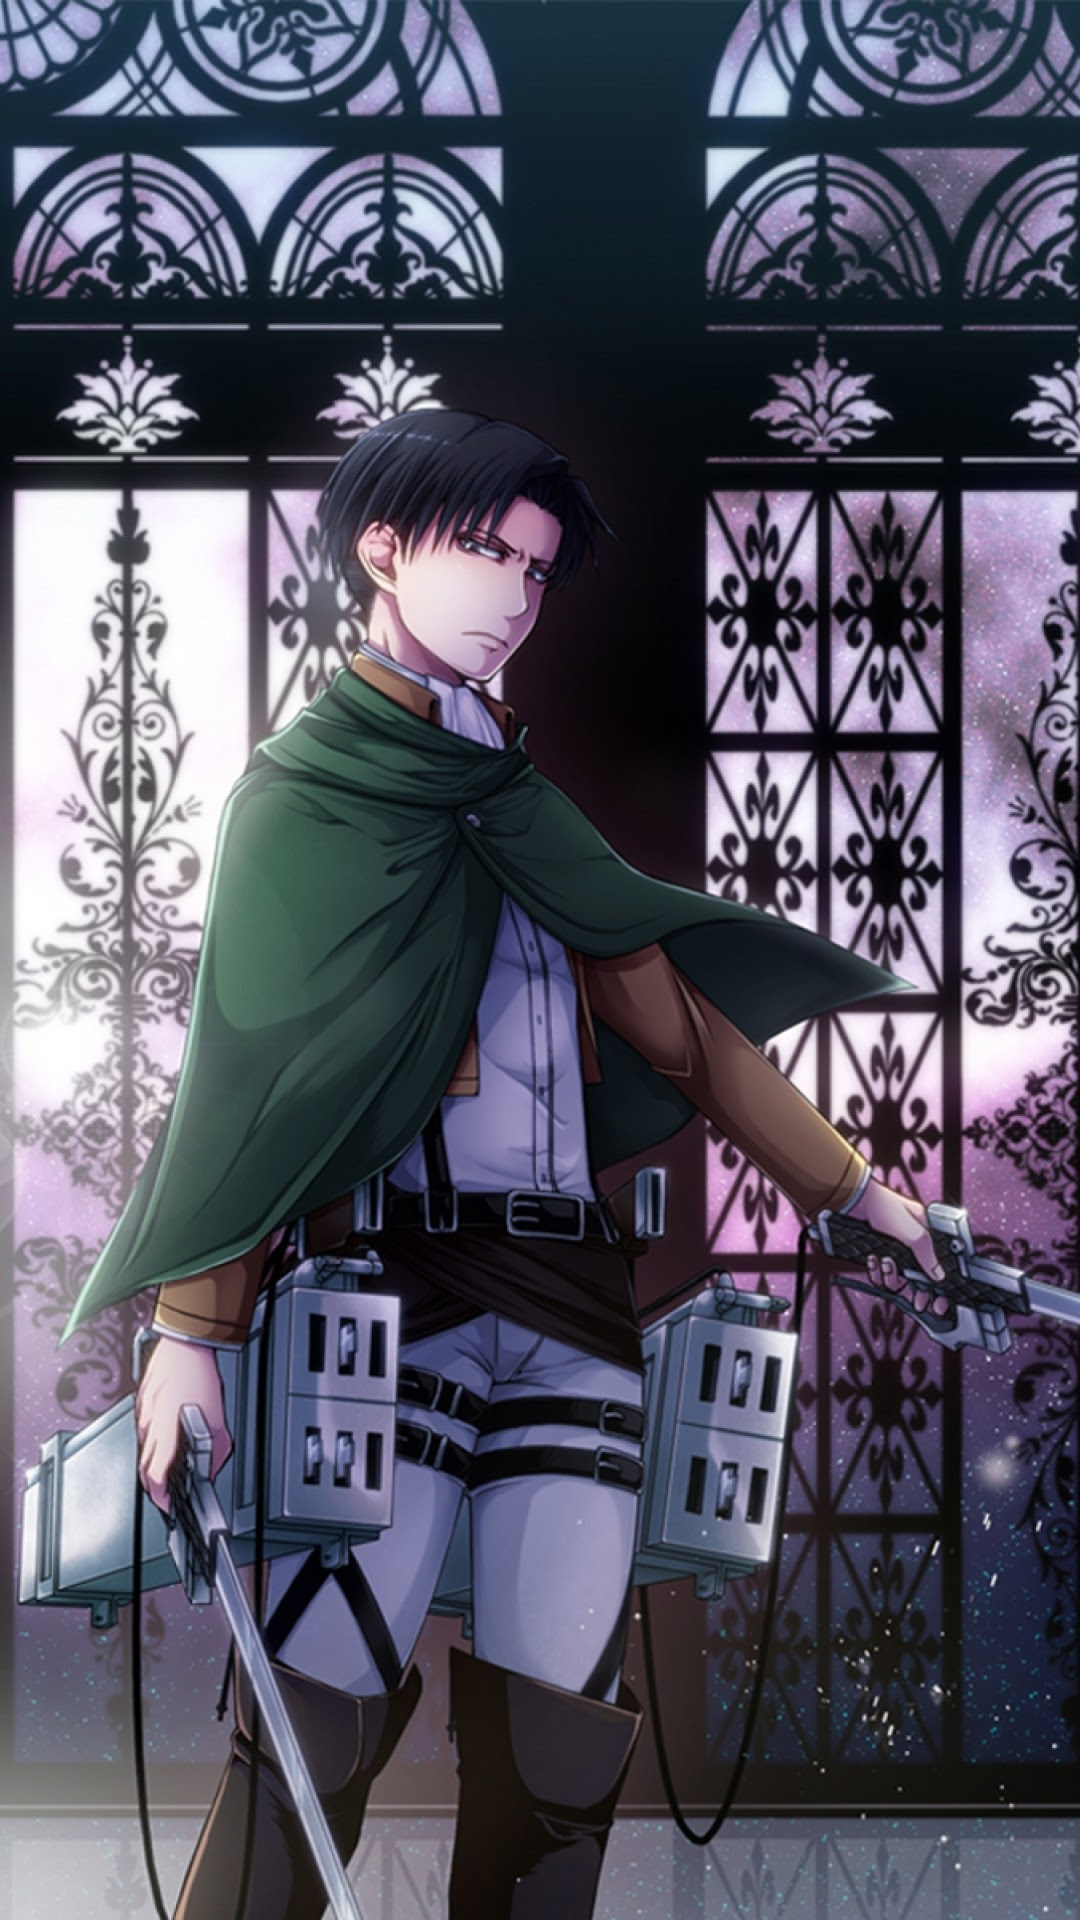 Anime Attack On Titan Levi Anime Wallpapers